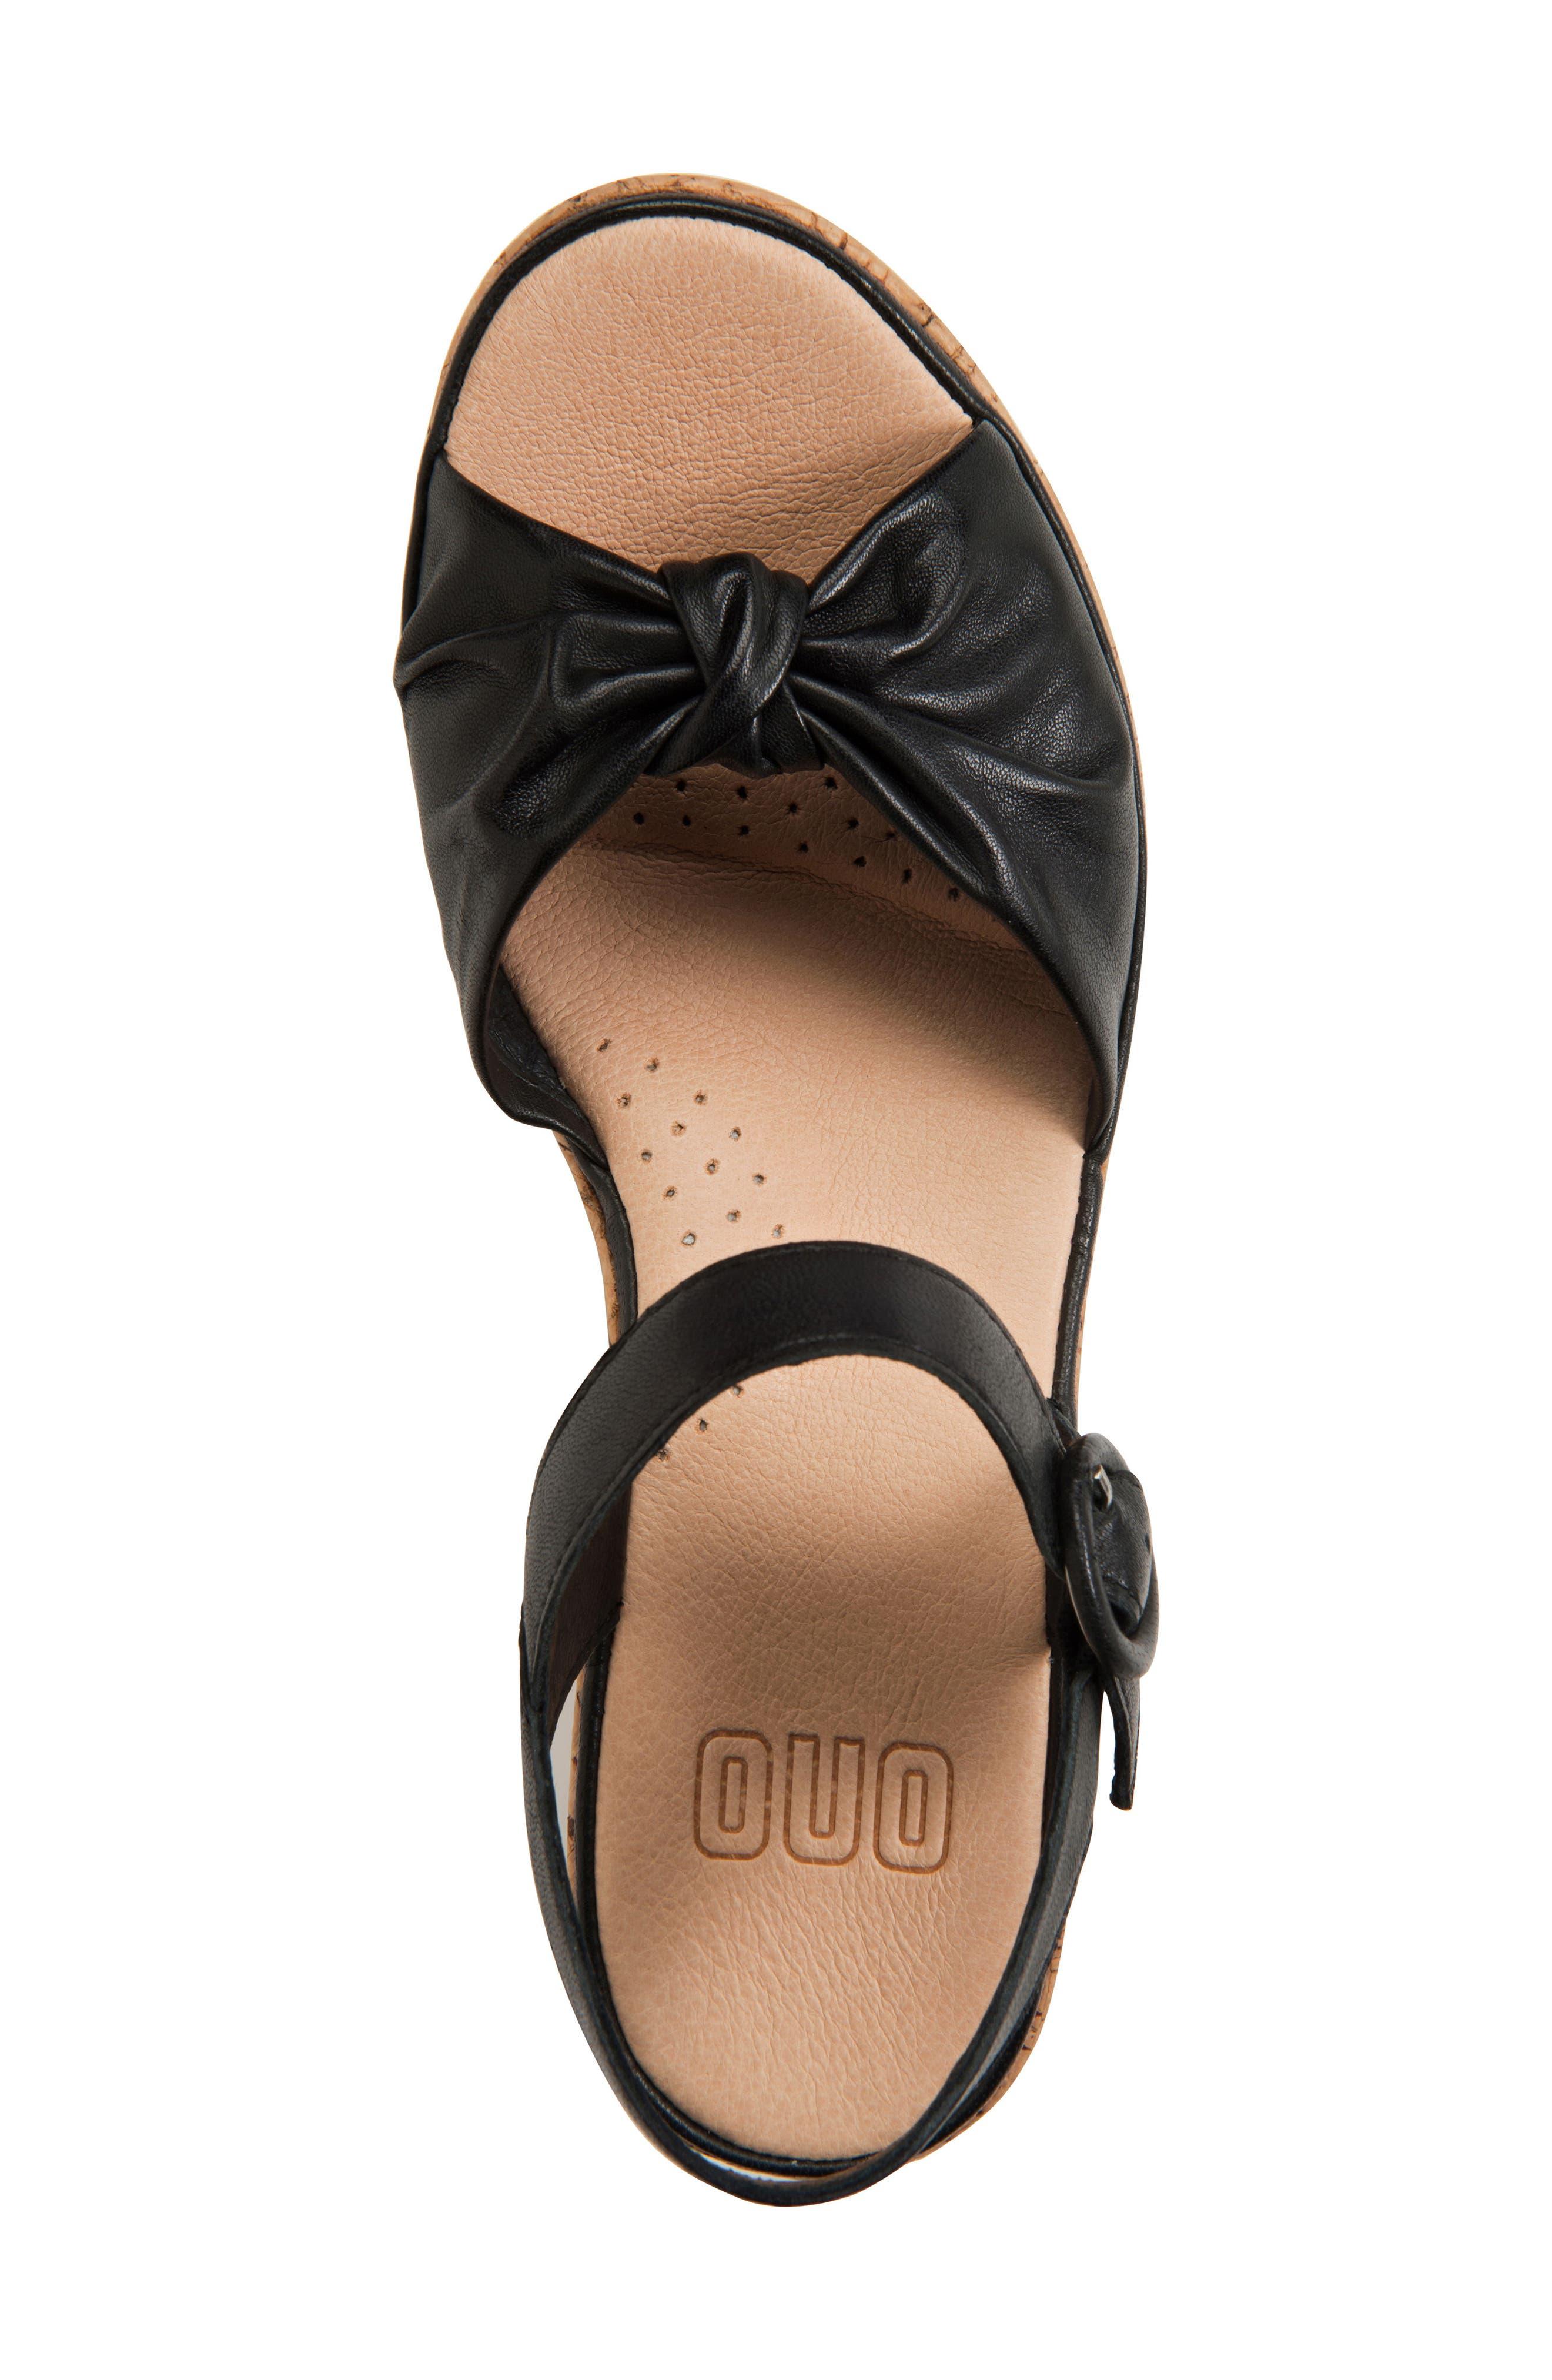 ONO, Heavenly Platform Wedge Sandal, Alternate thumbnail 5, color, BLACK LEATHER